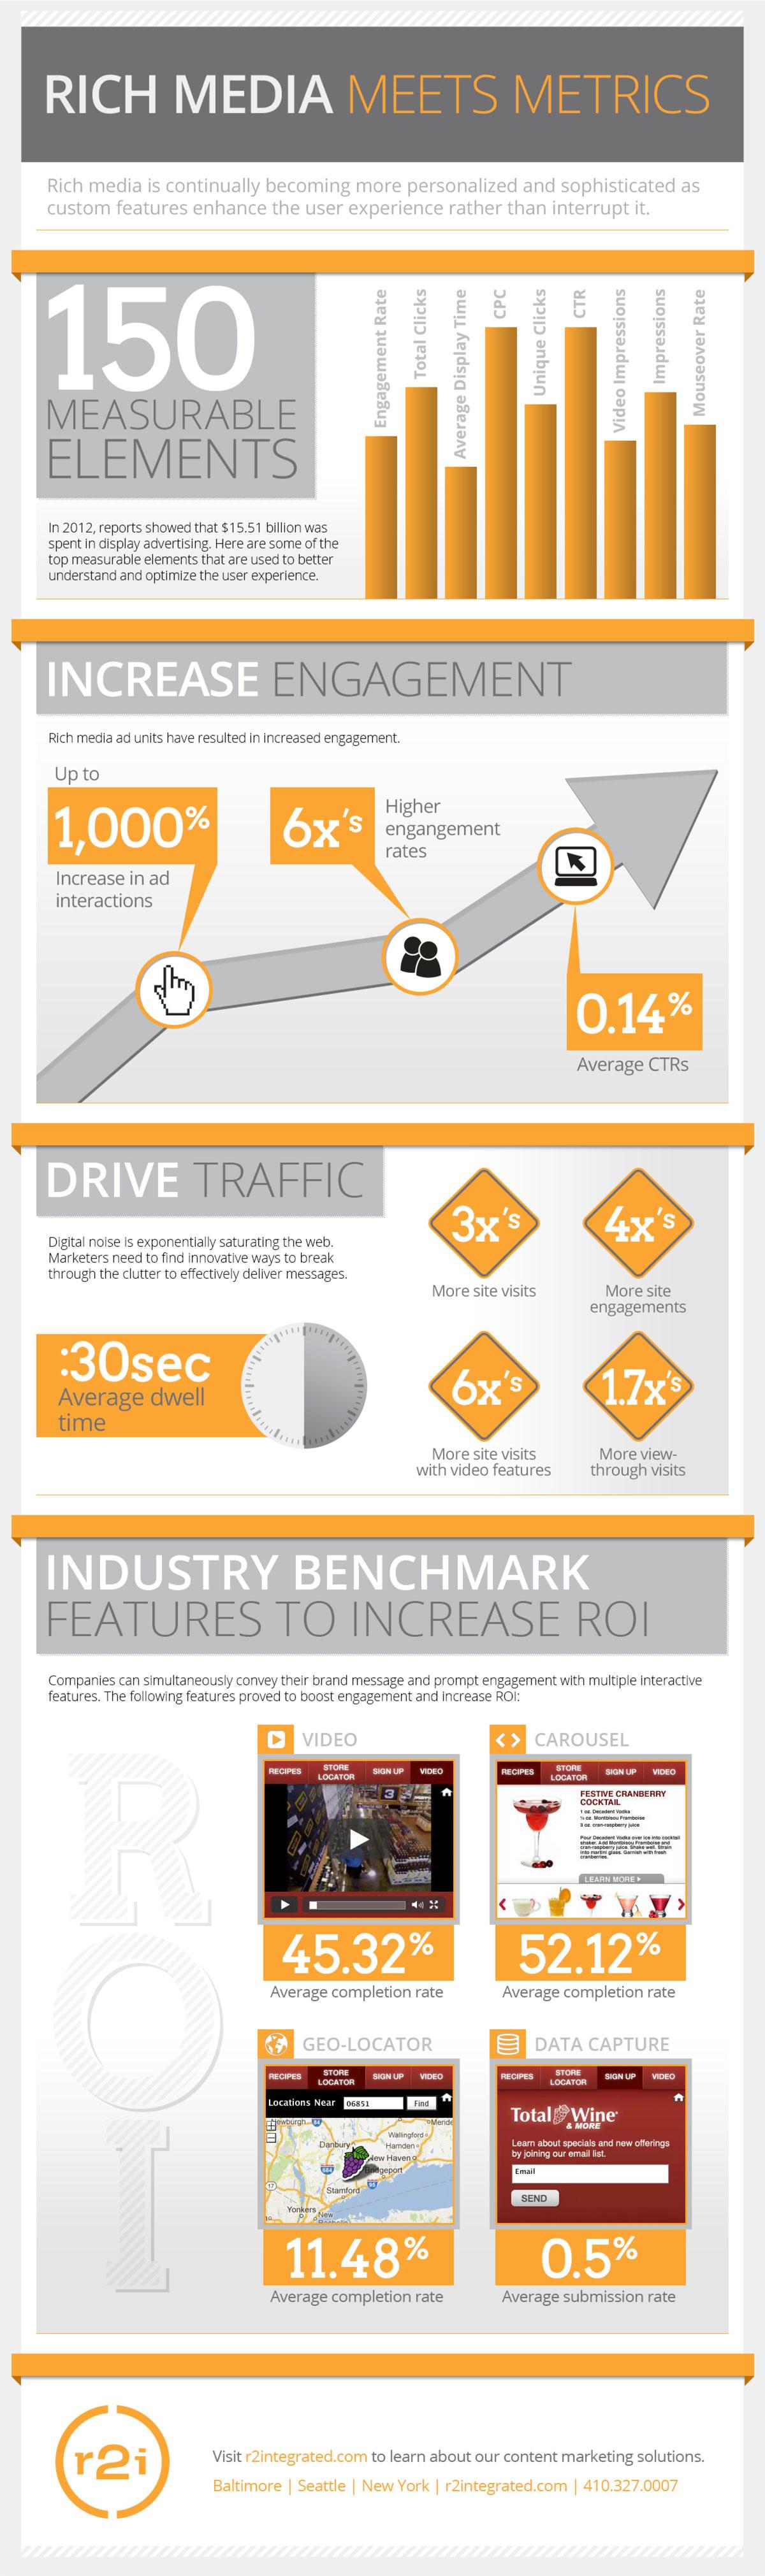 Mediamind 2012 Rich Media Benchmark Infographic Increase Engagement Media Infographic Marketing Topics